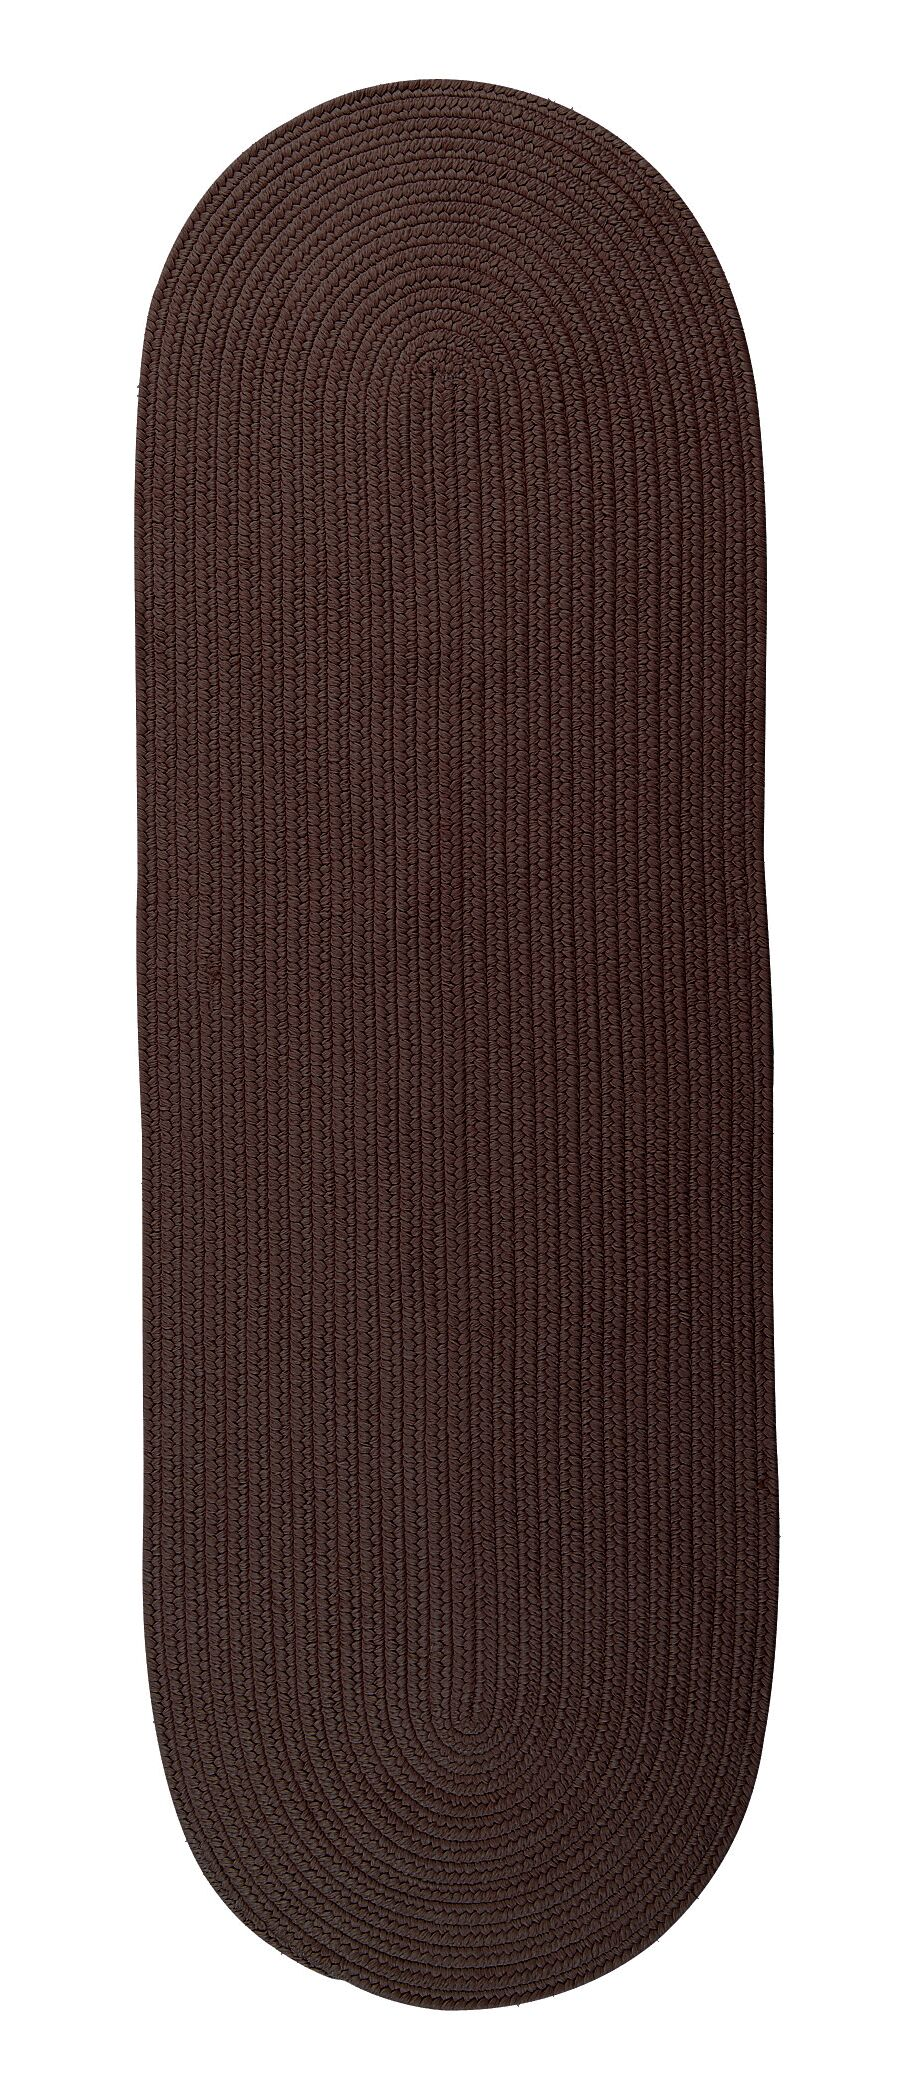 Willersley Reversible Hand-Braided Brown Indoor/Outdoor Area Rug Rug Size: Runner 2'4